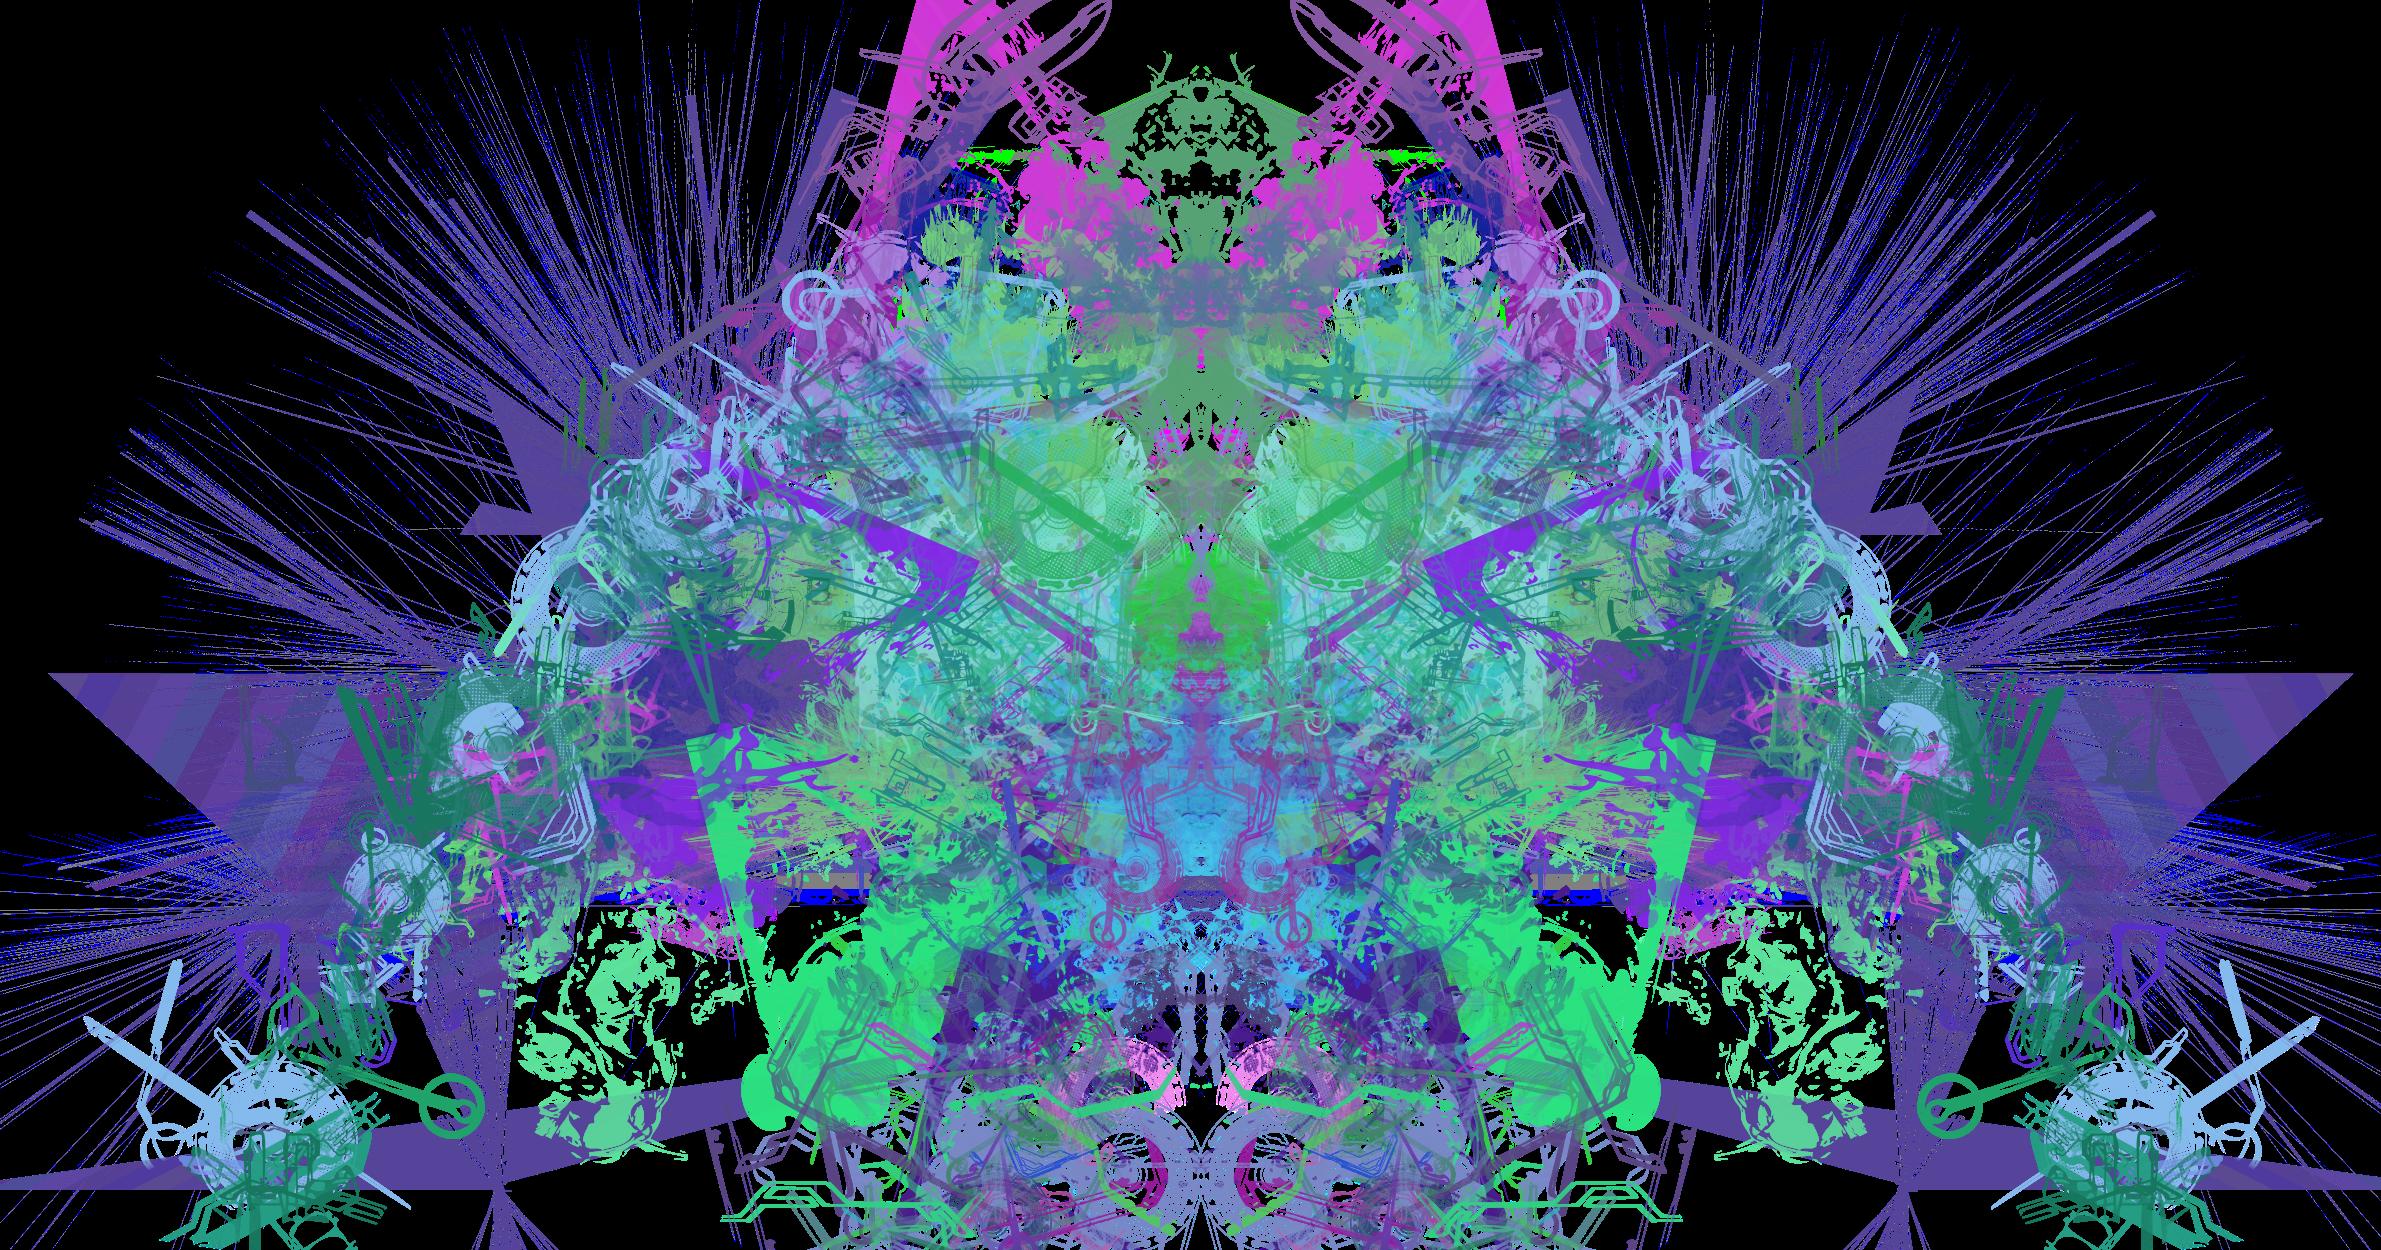 [ArtWork] Guns Mecha Gearsof_amachine_by_ph3nf1x-d4wginv